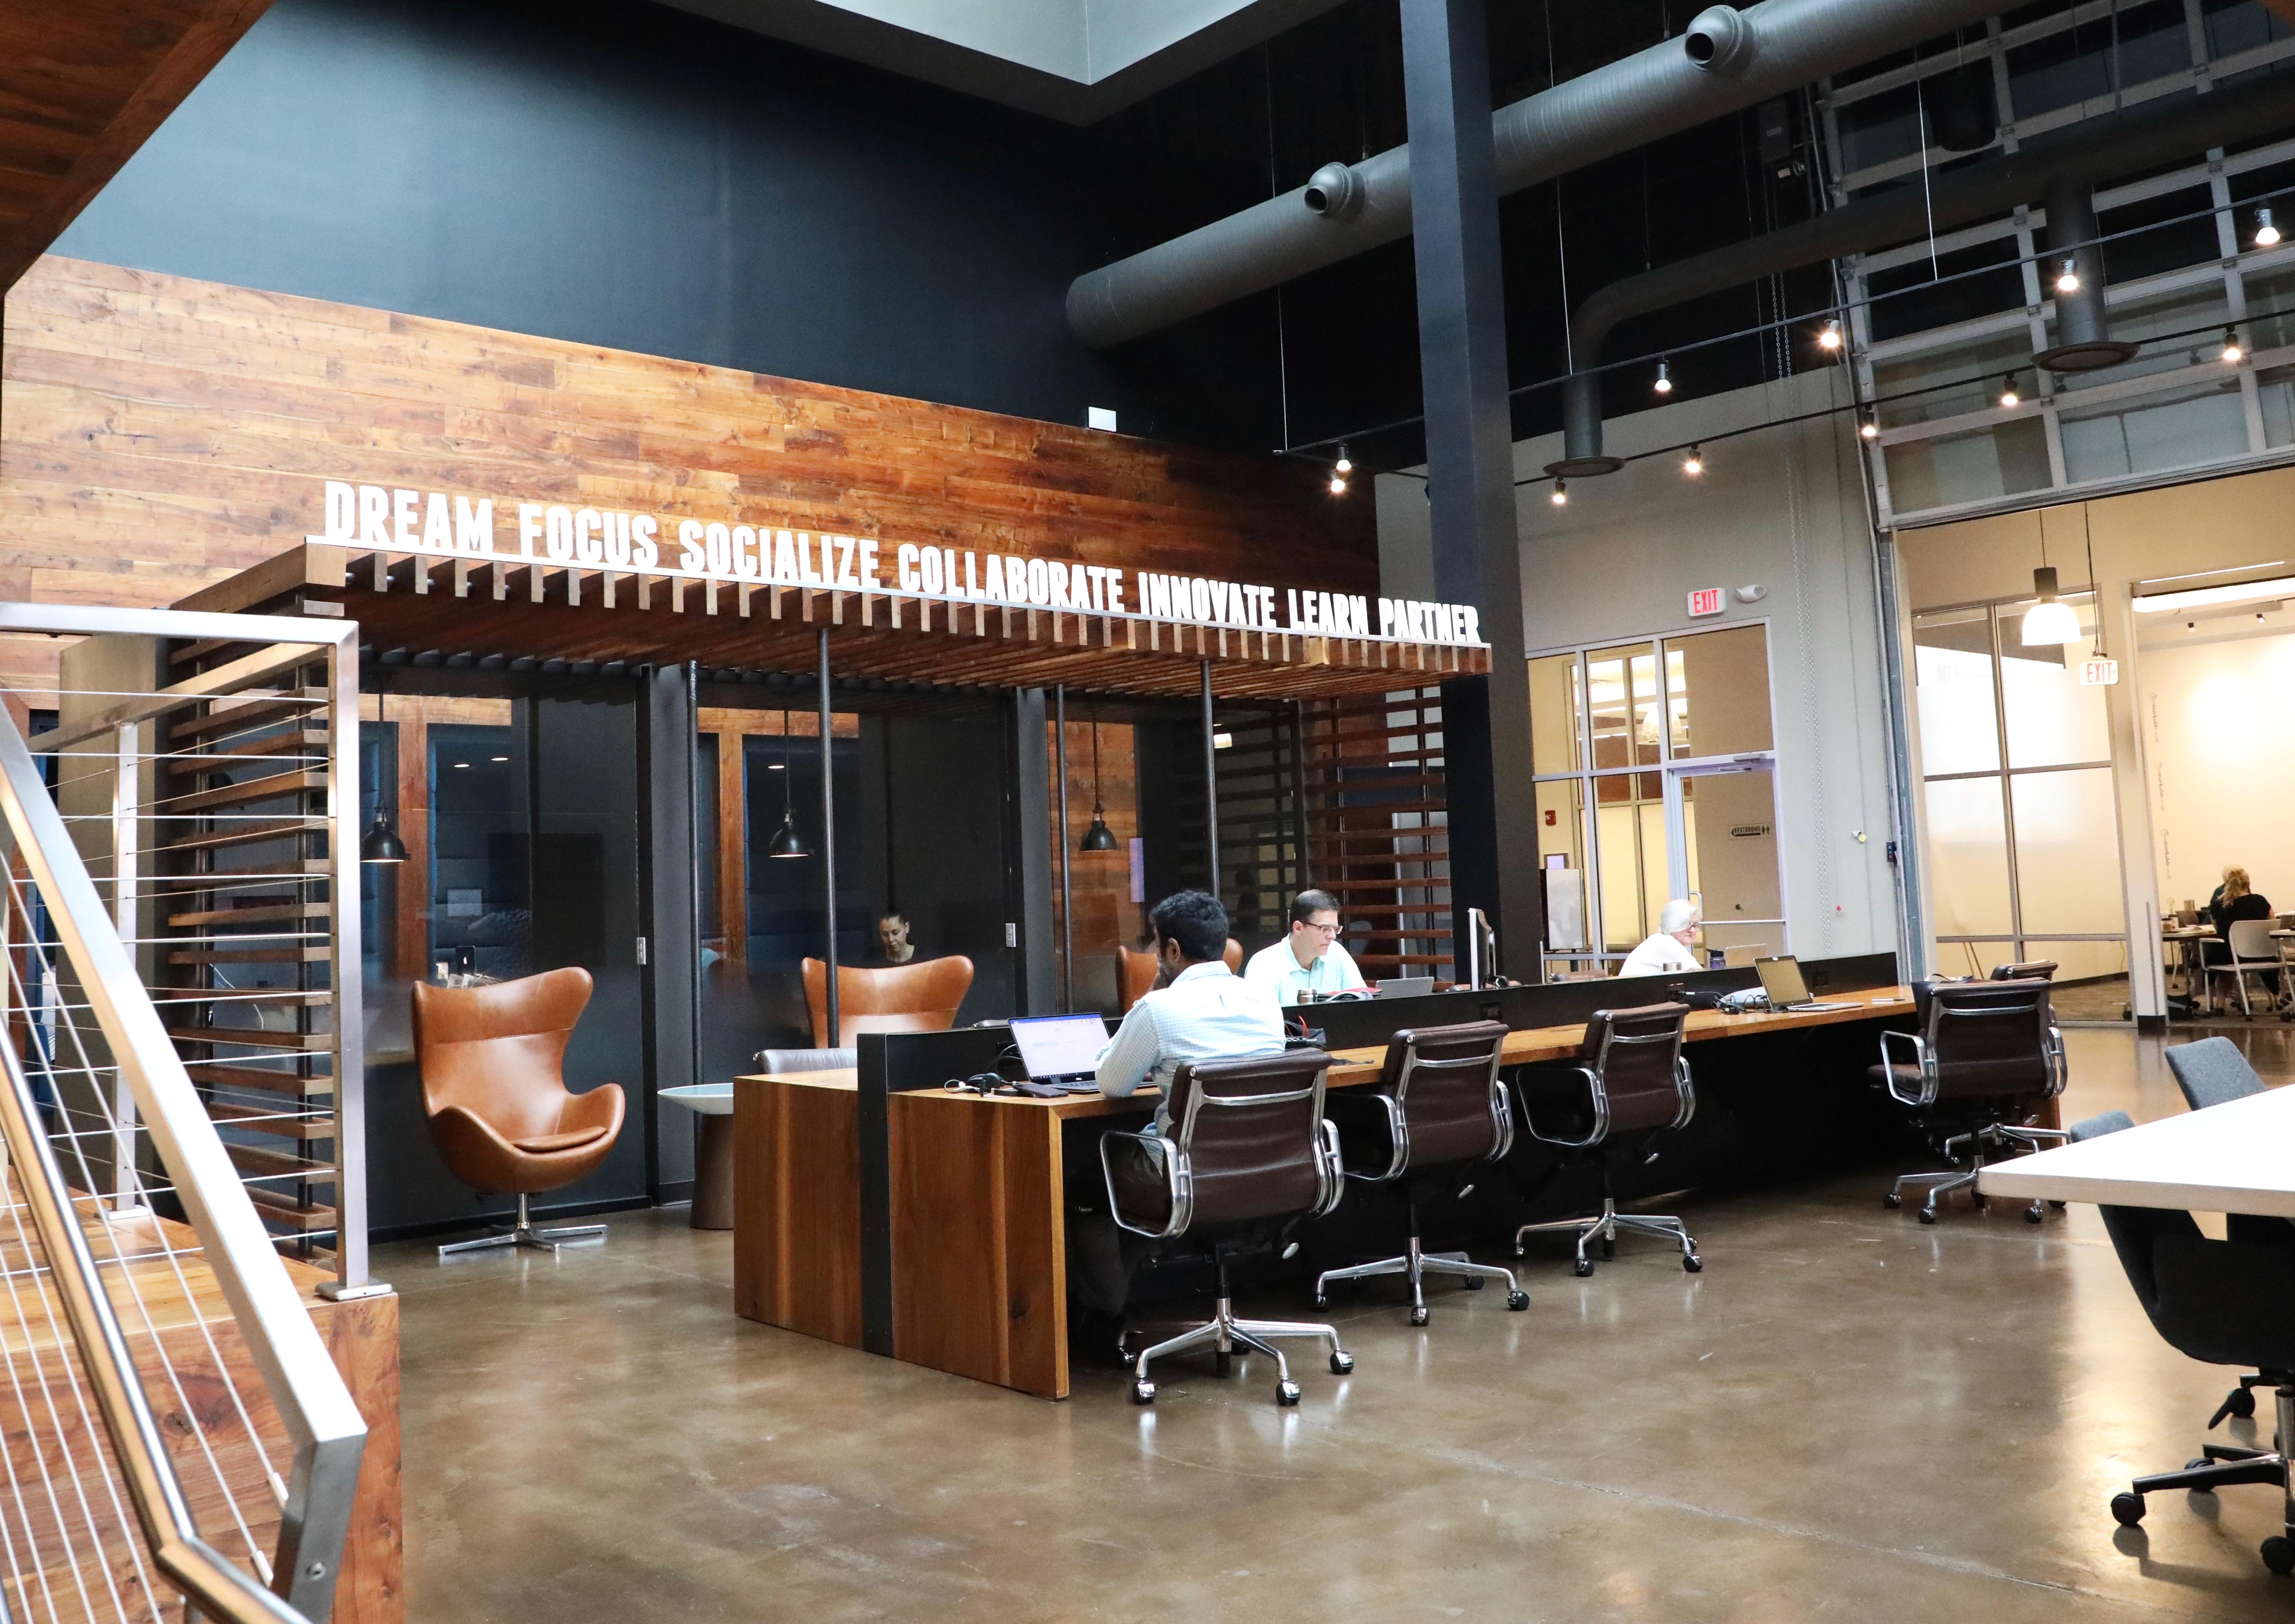 Shared workspace at Roam Galleria